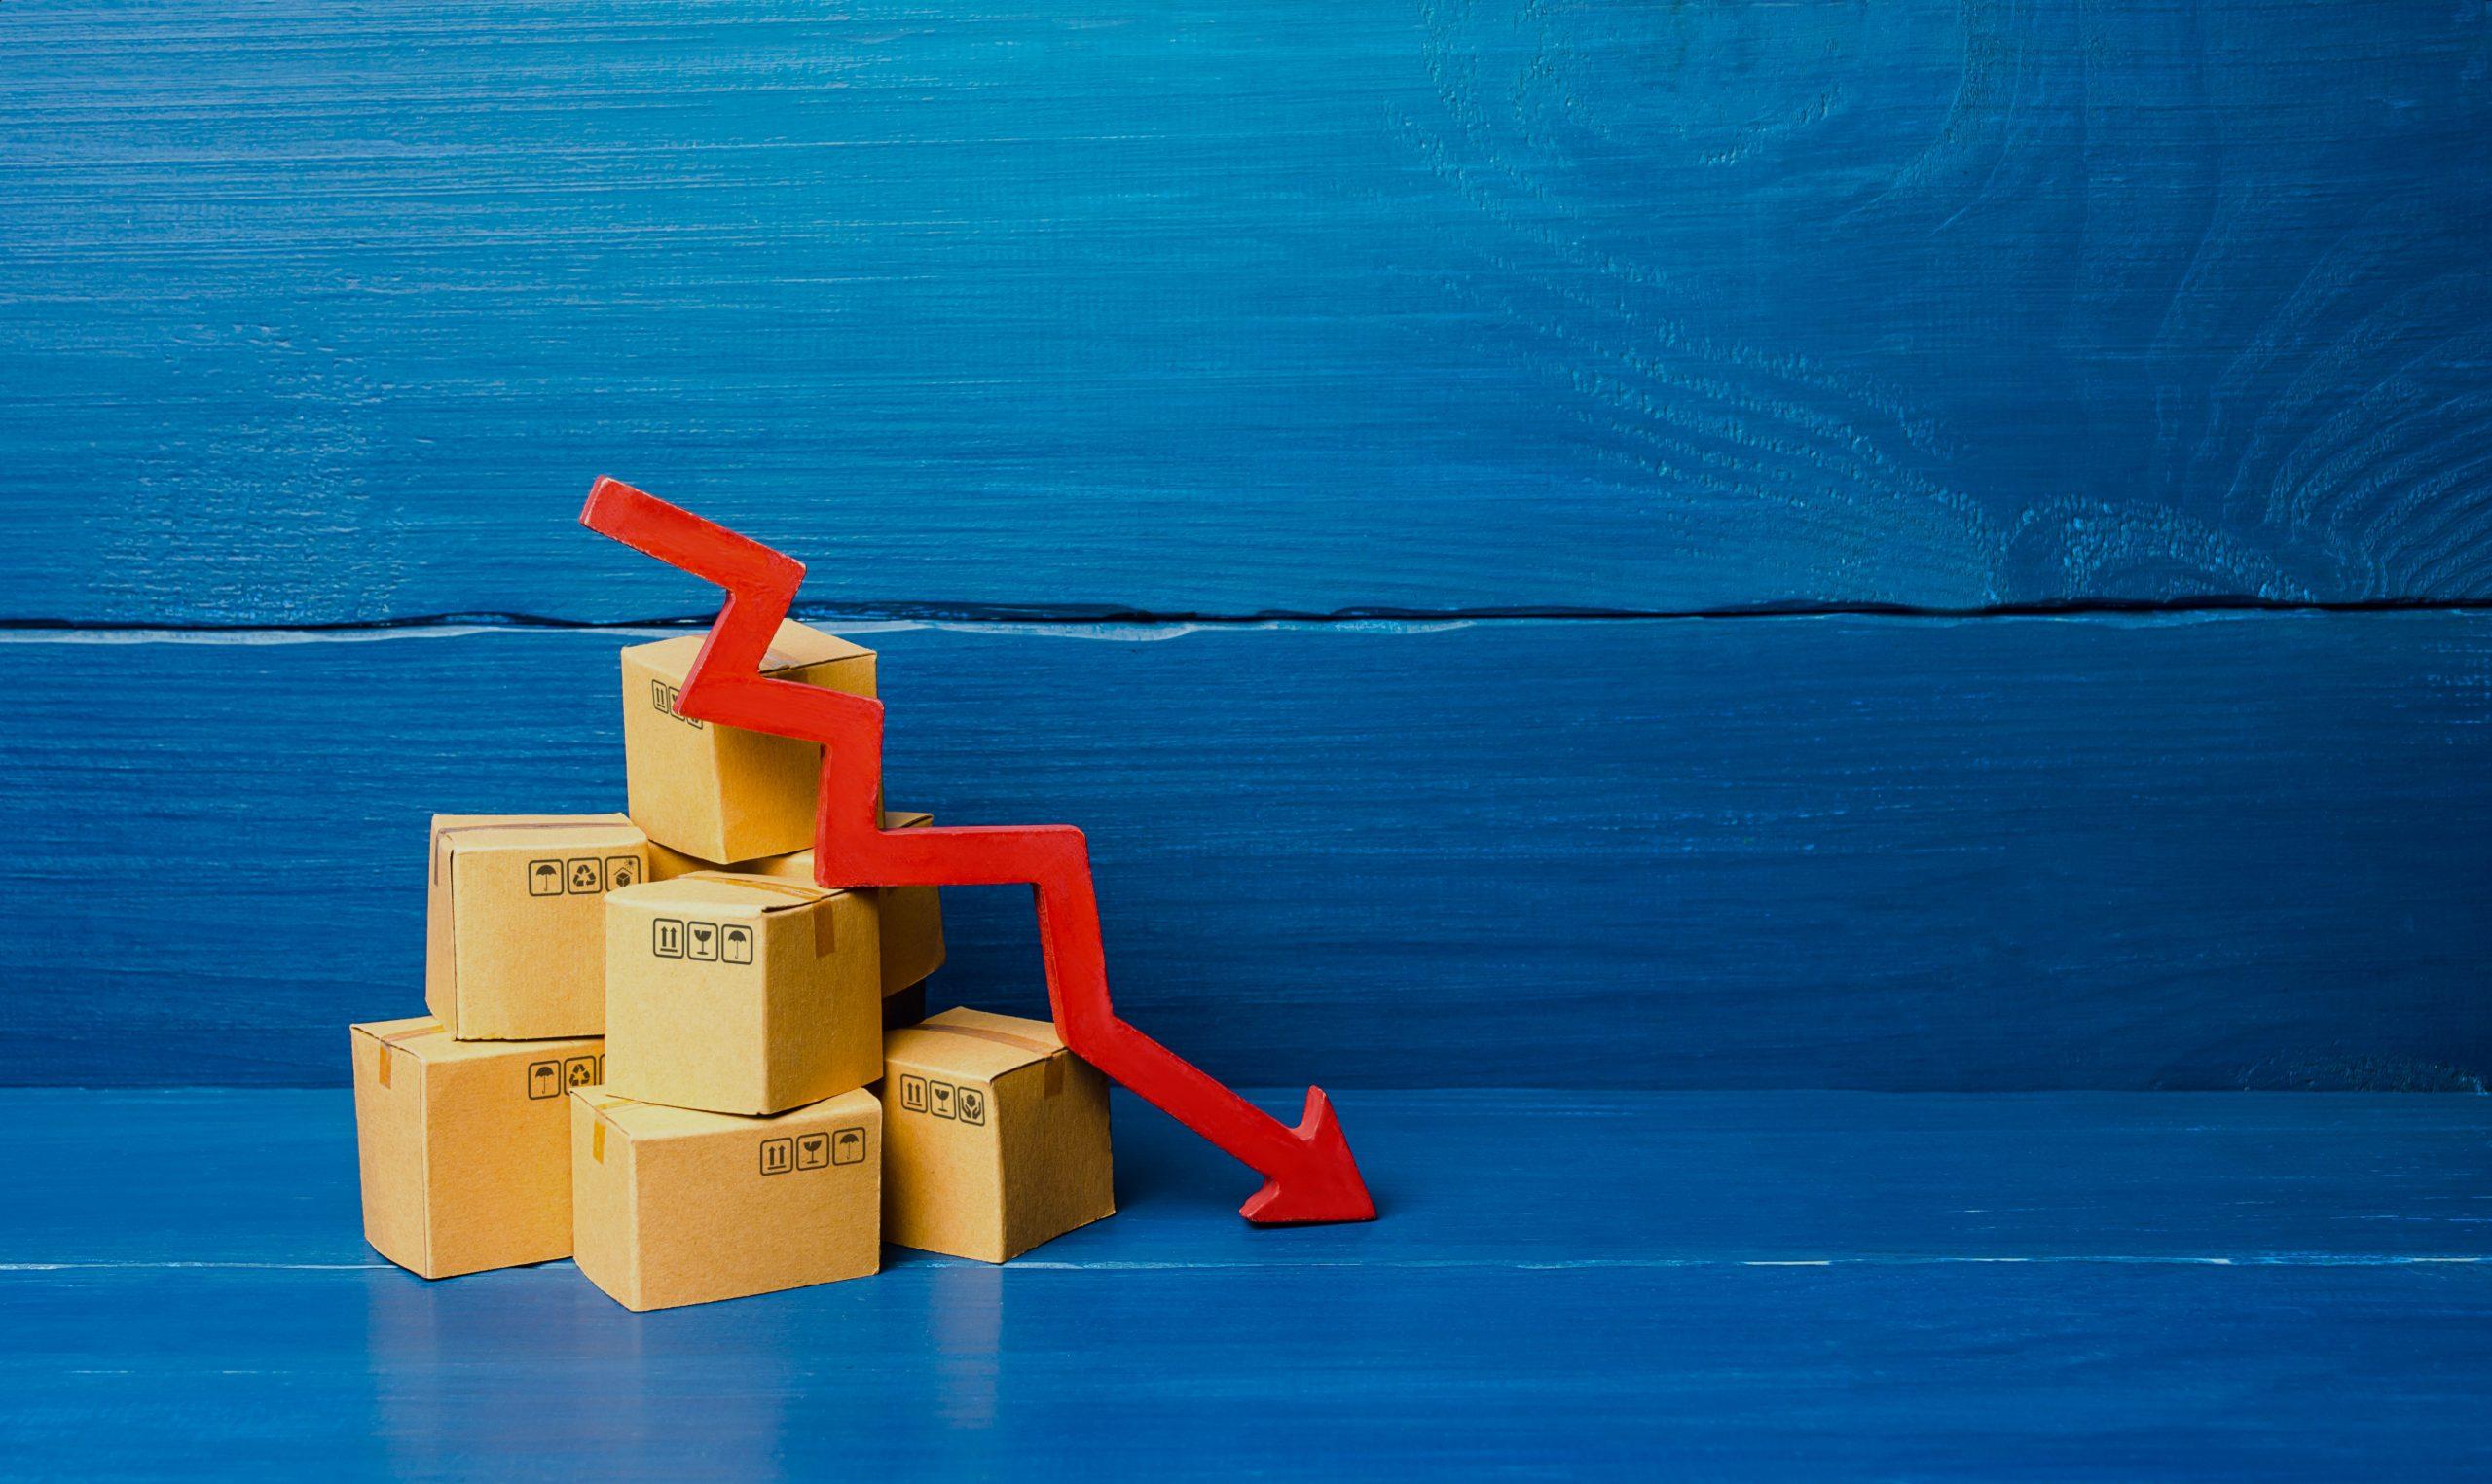 Amazon Sales Have Slowed